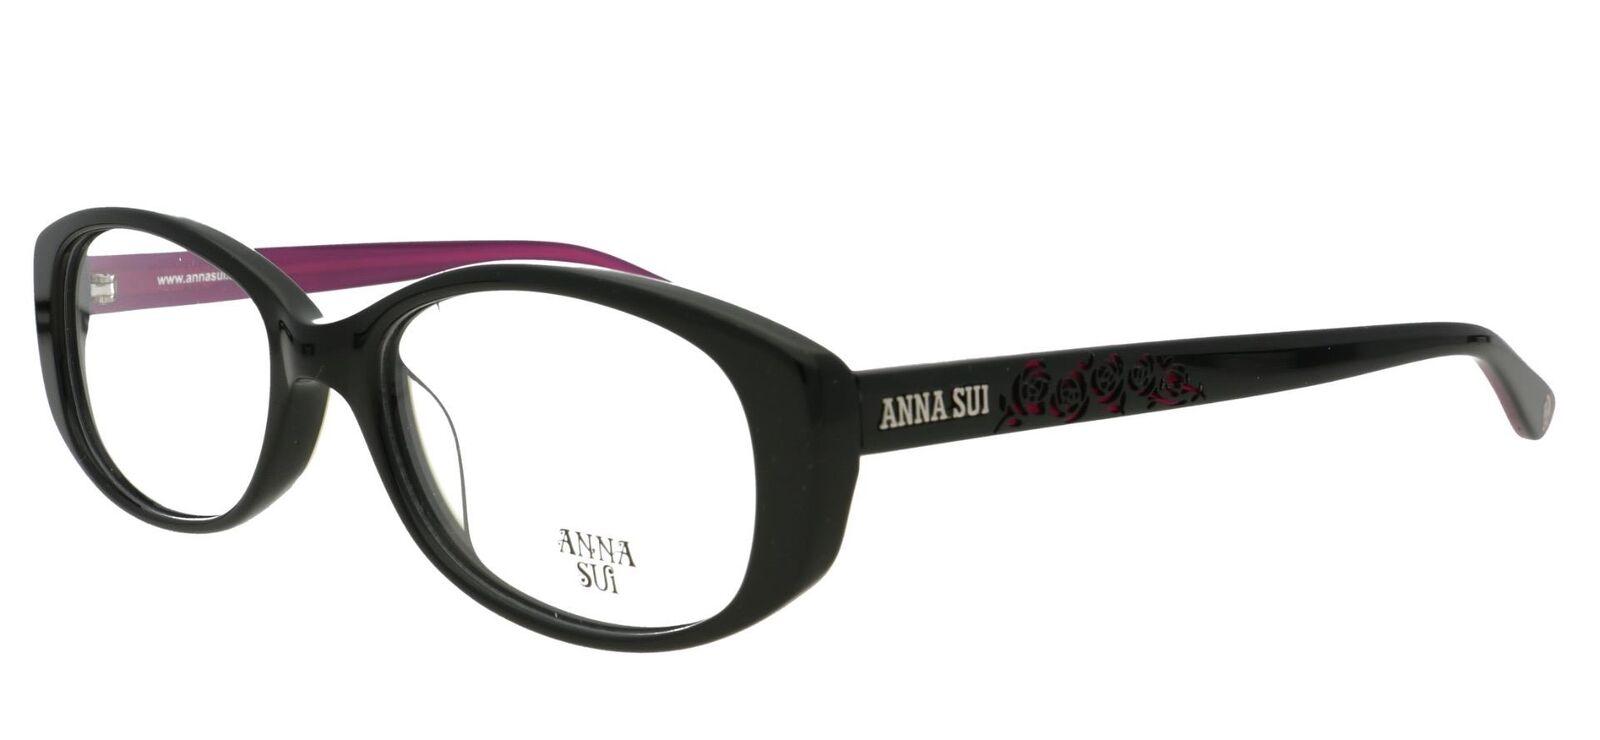 Anna Sui Como 577 001 Gafas Rx Óptico Monturas + Estuche + Paño